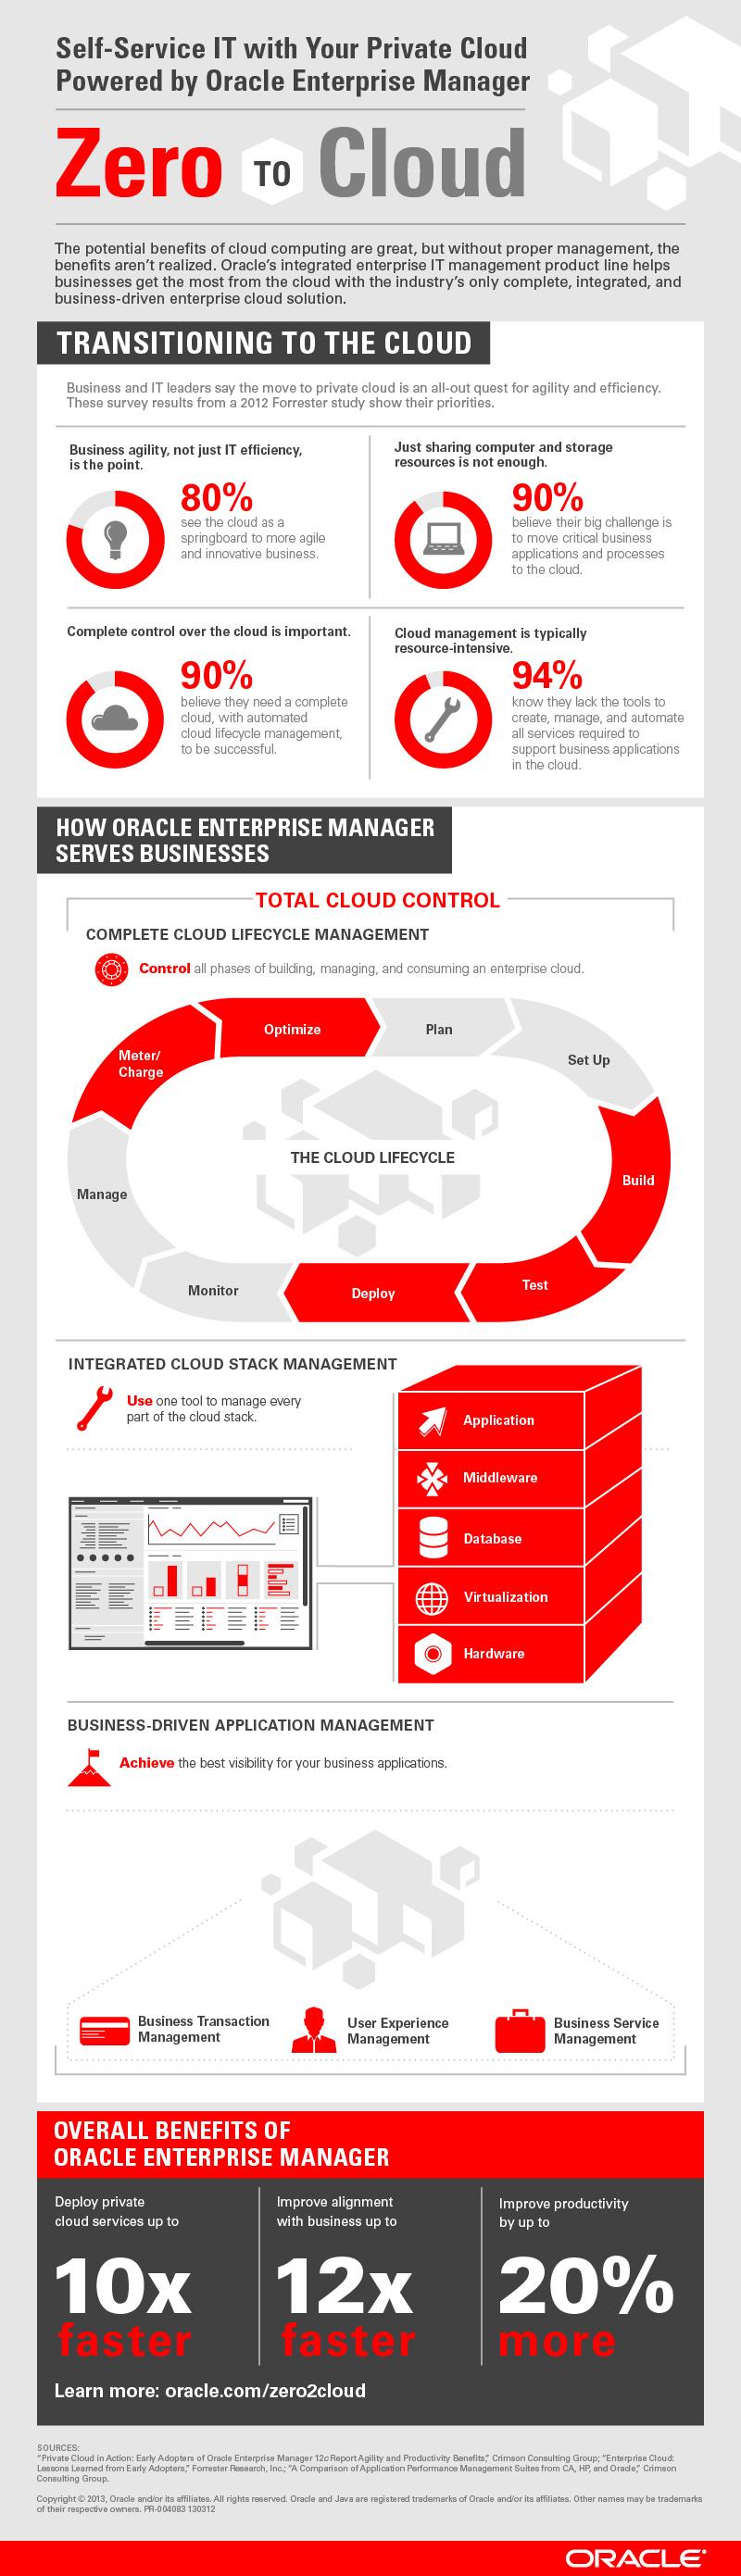 130312_Oracle_Enterprise_Manager_INFO.jpg